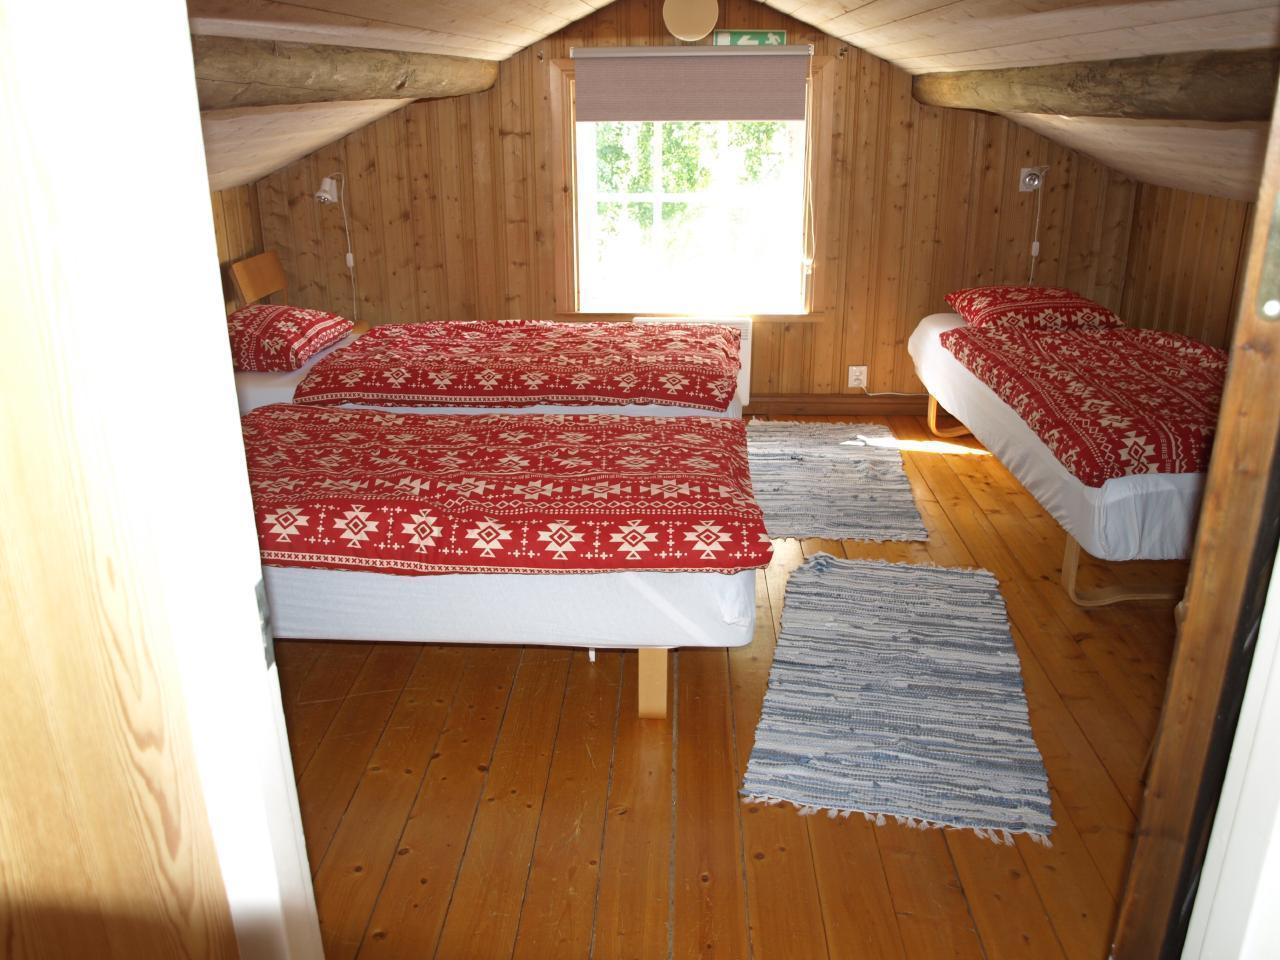 Ferienhaus Trollstuga (1079397), Gargnäs, Västerbottens län, Nordschweden, Schweden, Bild 14